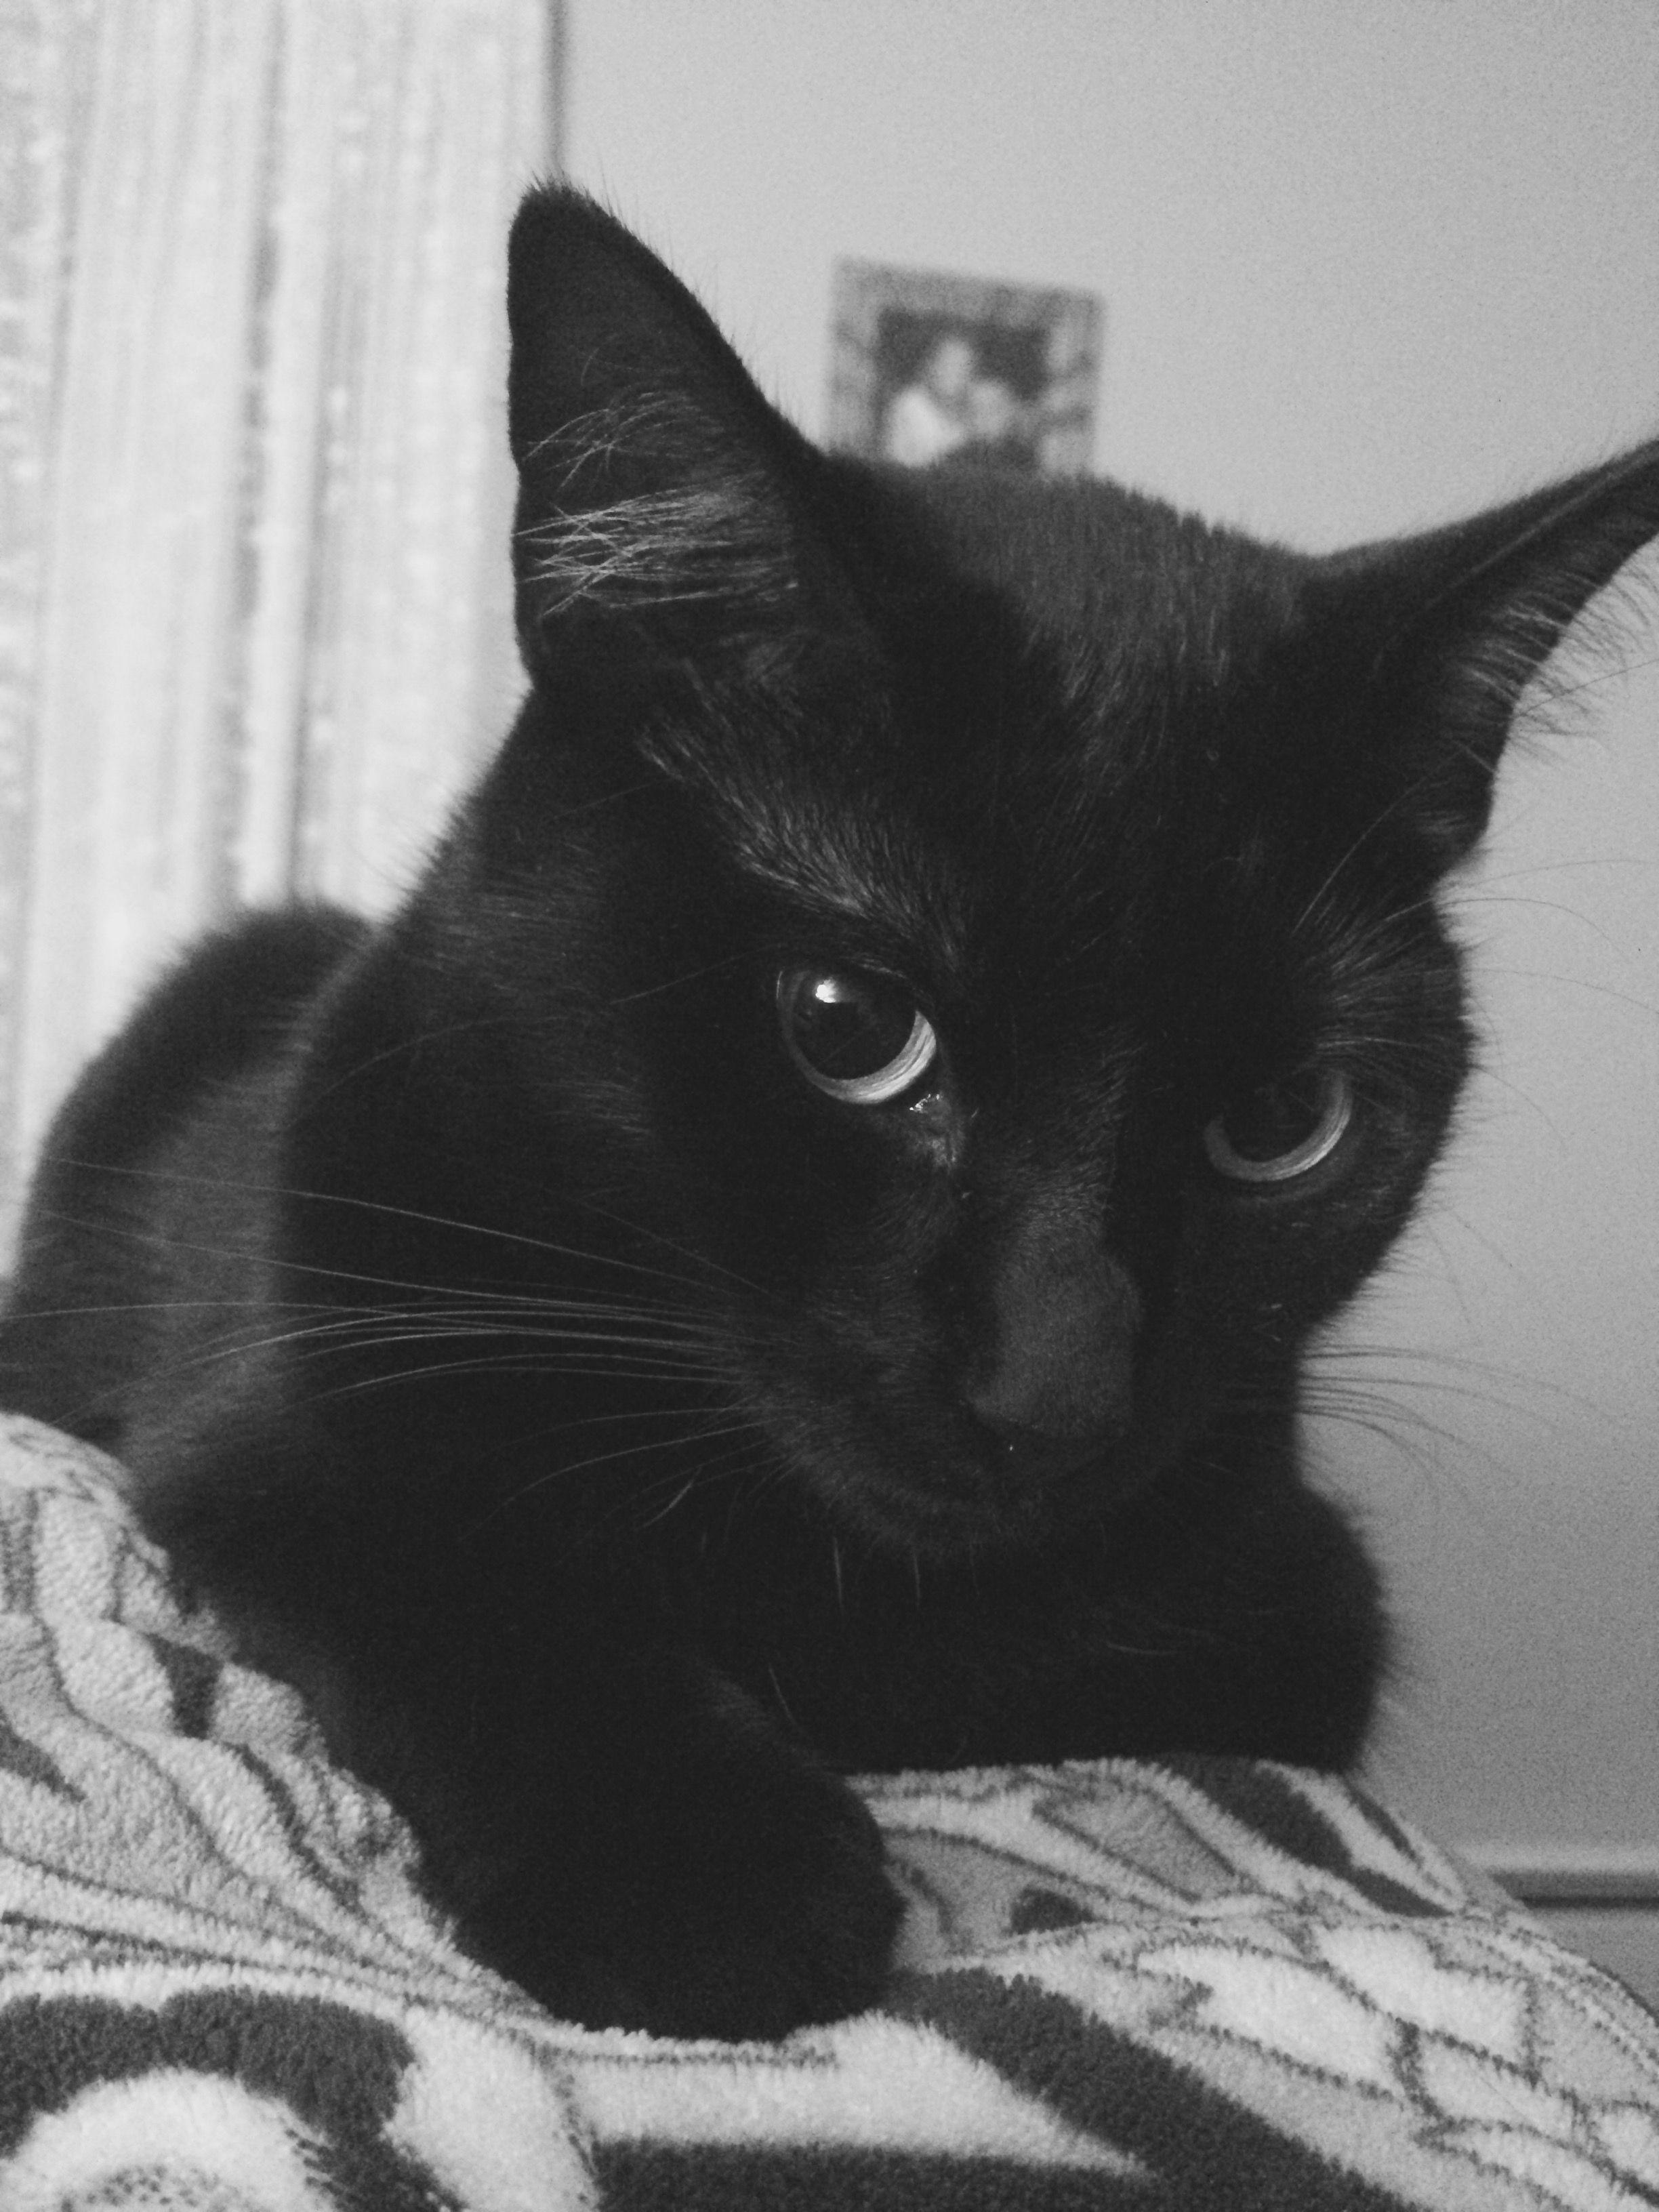 Pin by Cassie Trendell on My Cassie baby Cat allergies